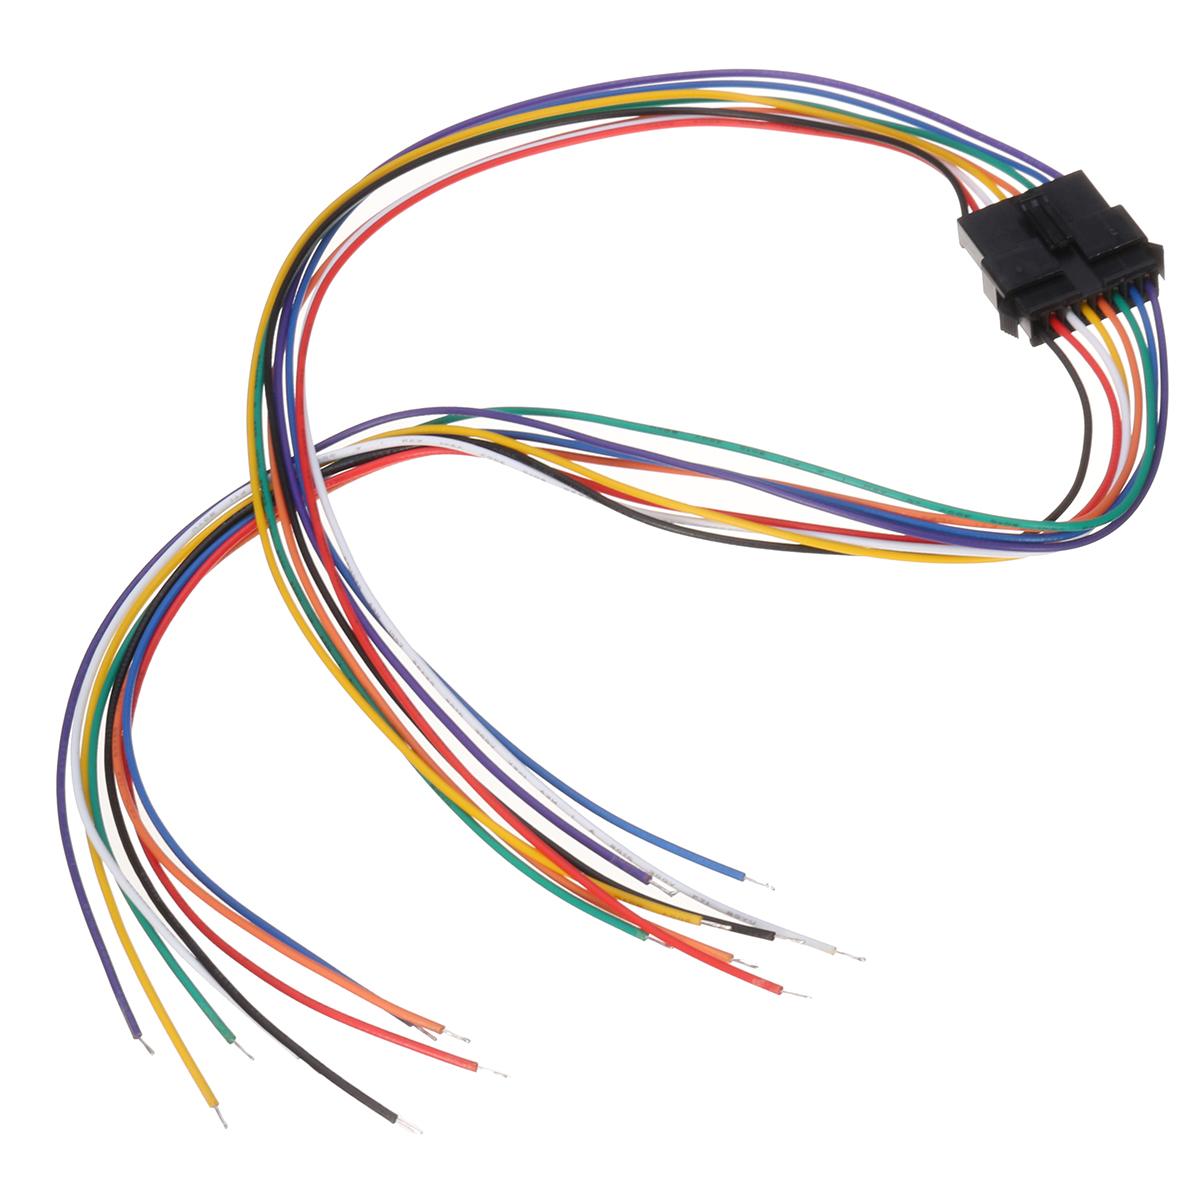 10 Set Jst 2 5mm Sm 8 Pin Male Amp Female Connector Plug